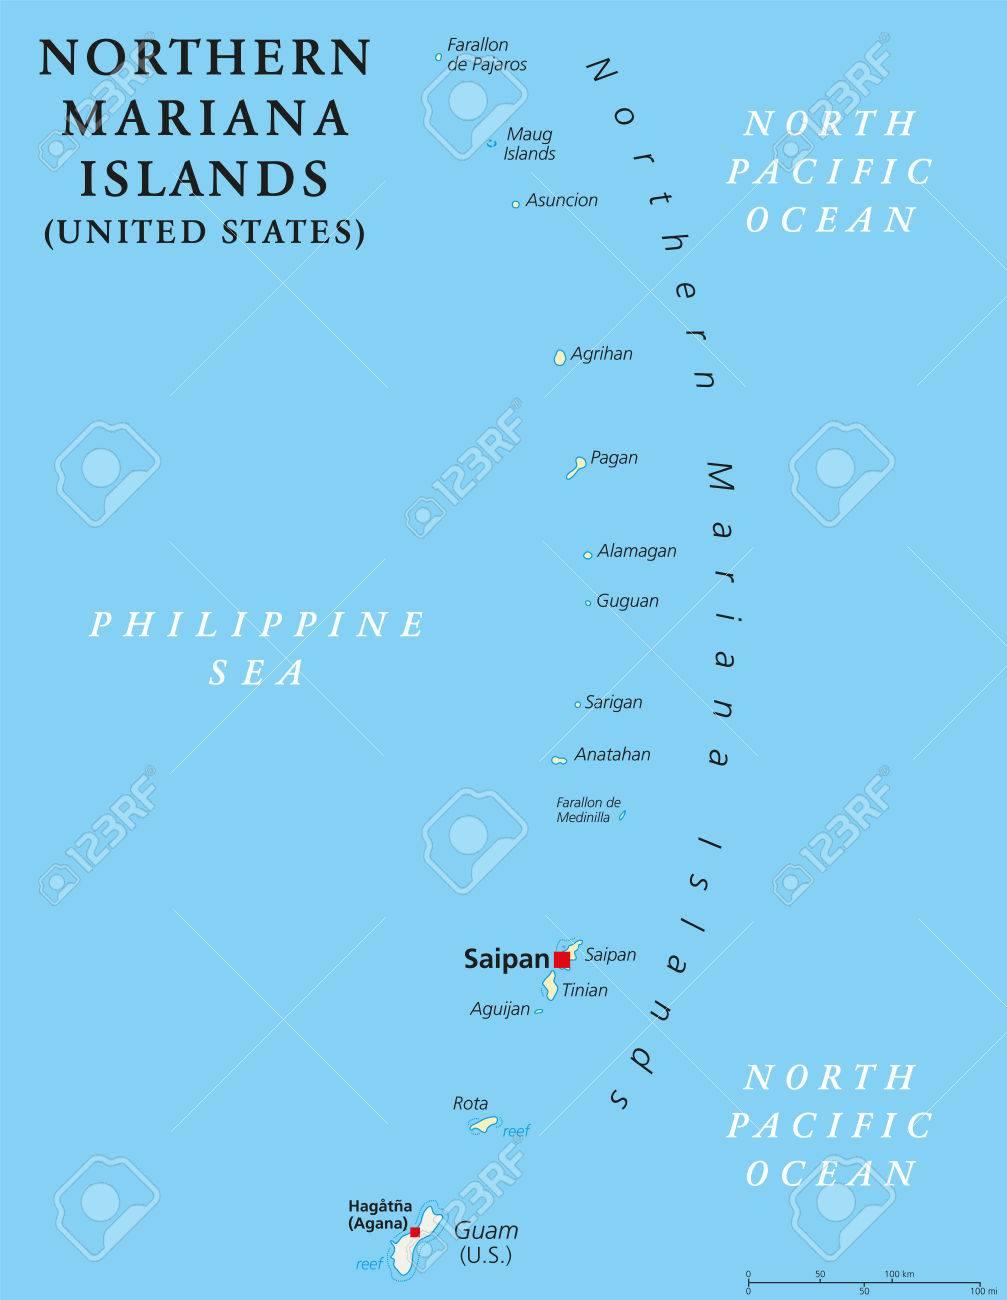 Northern Mariana Islands Political Map With Capital Saipan. Insular ...